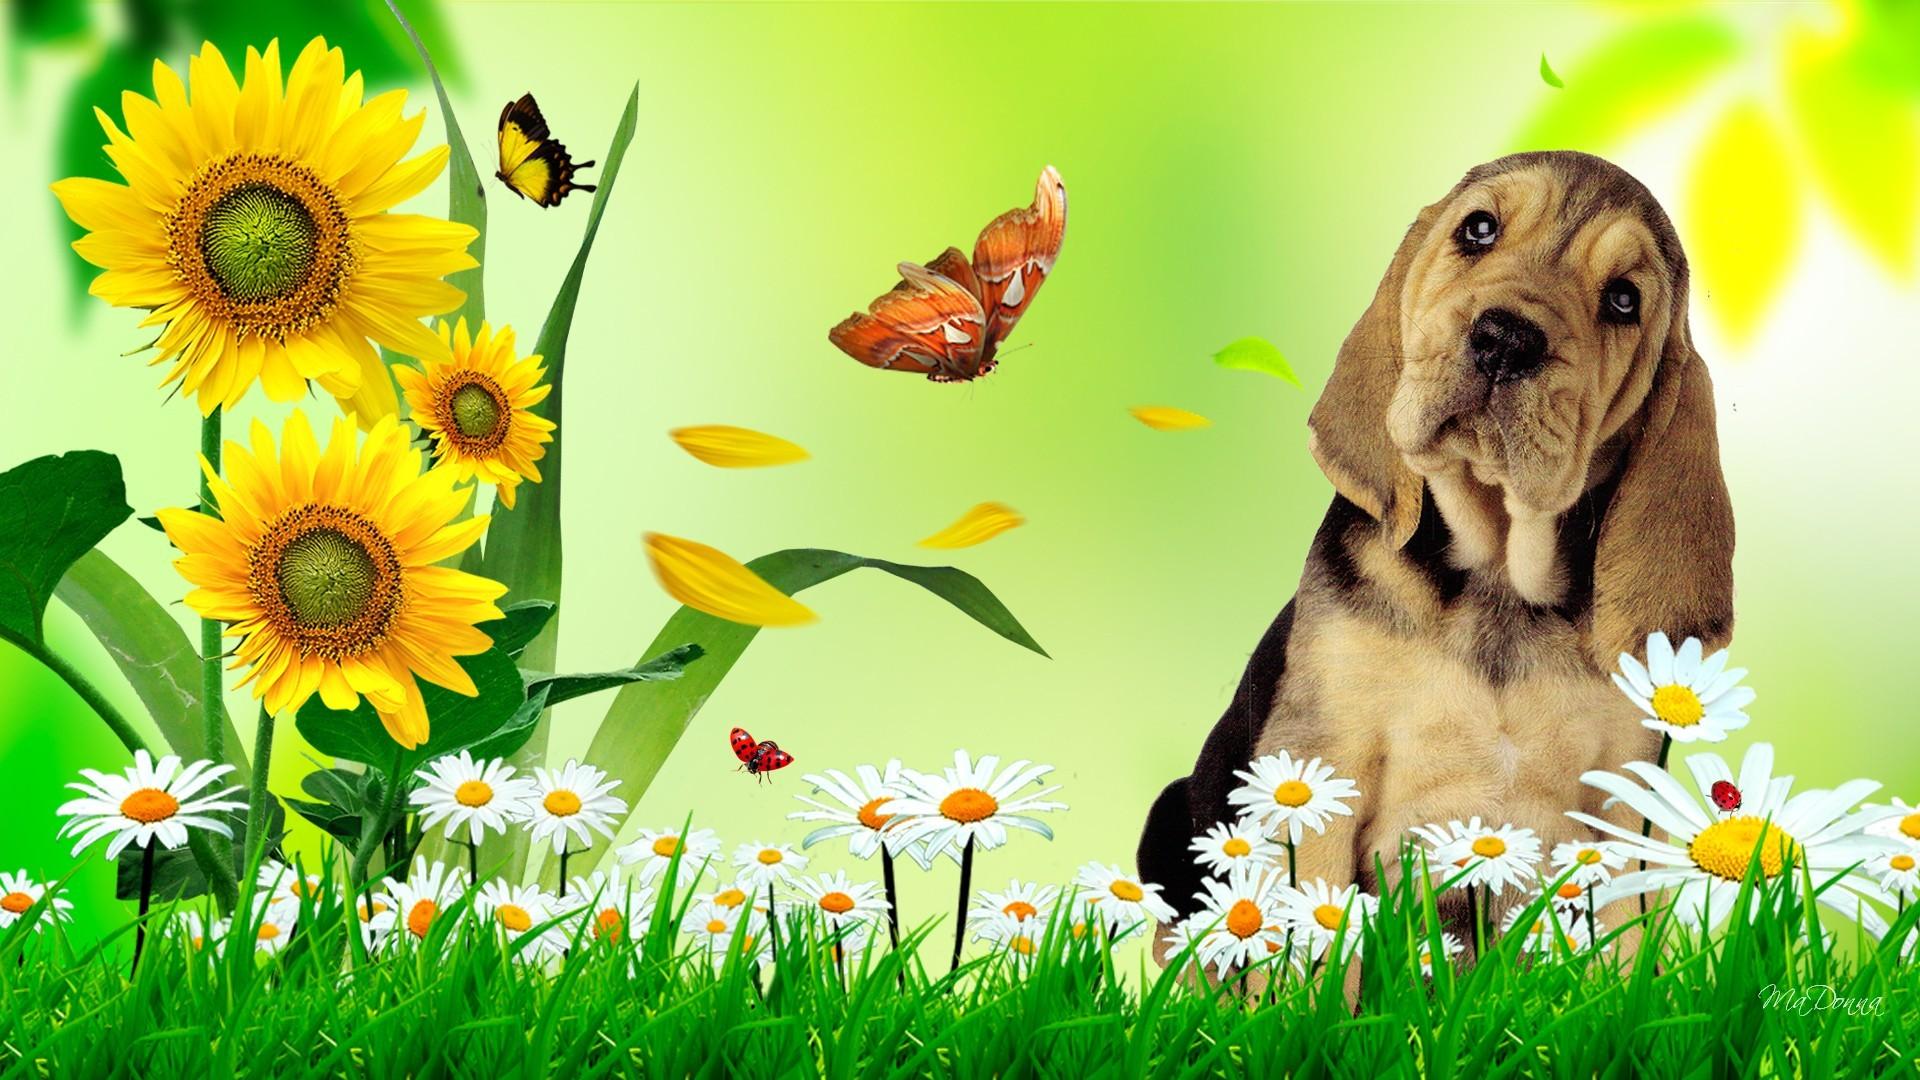 Cute Puppies Wallpaper Backgrounds Summer Wallpaper Hd Free Download Pixelstalk Net